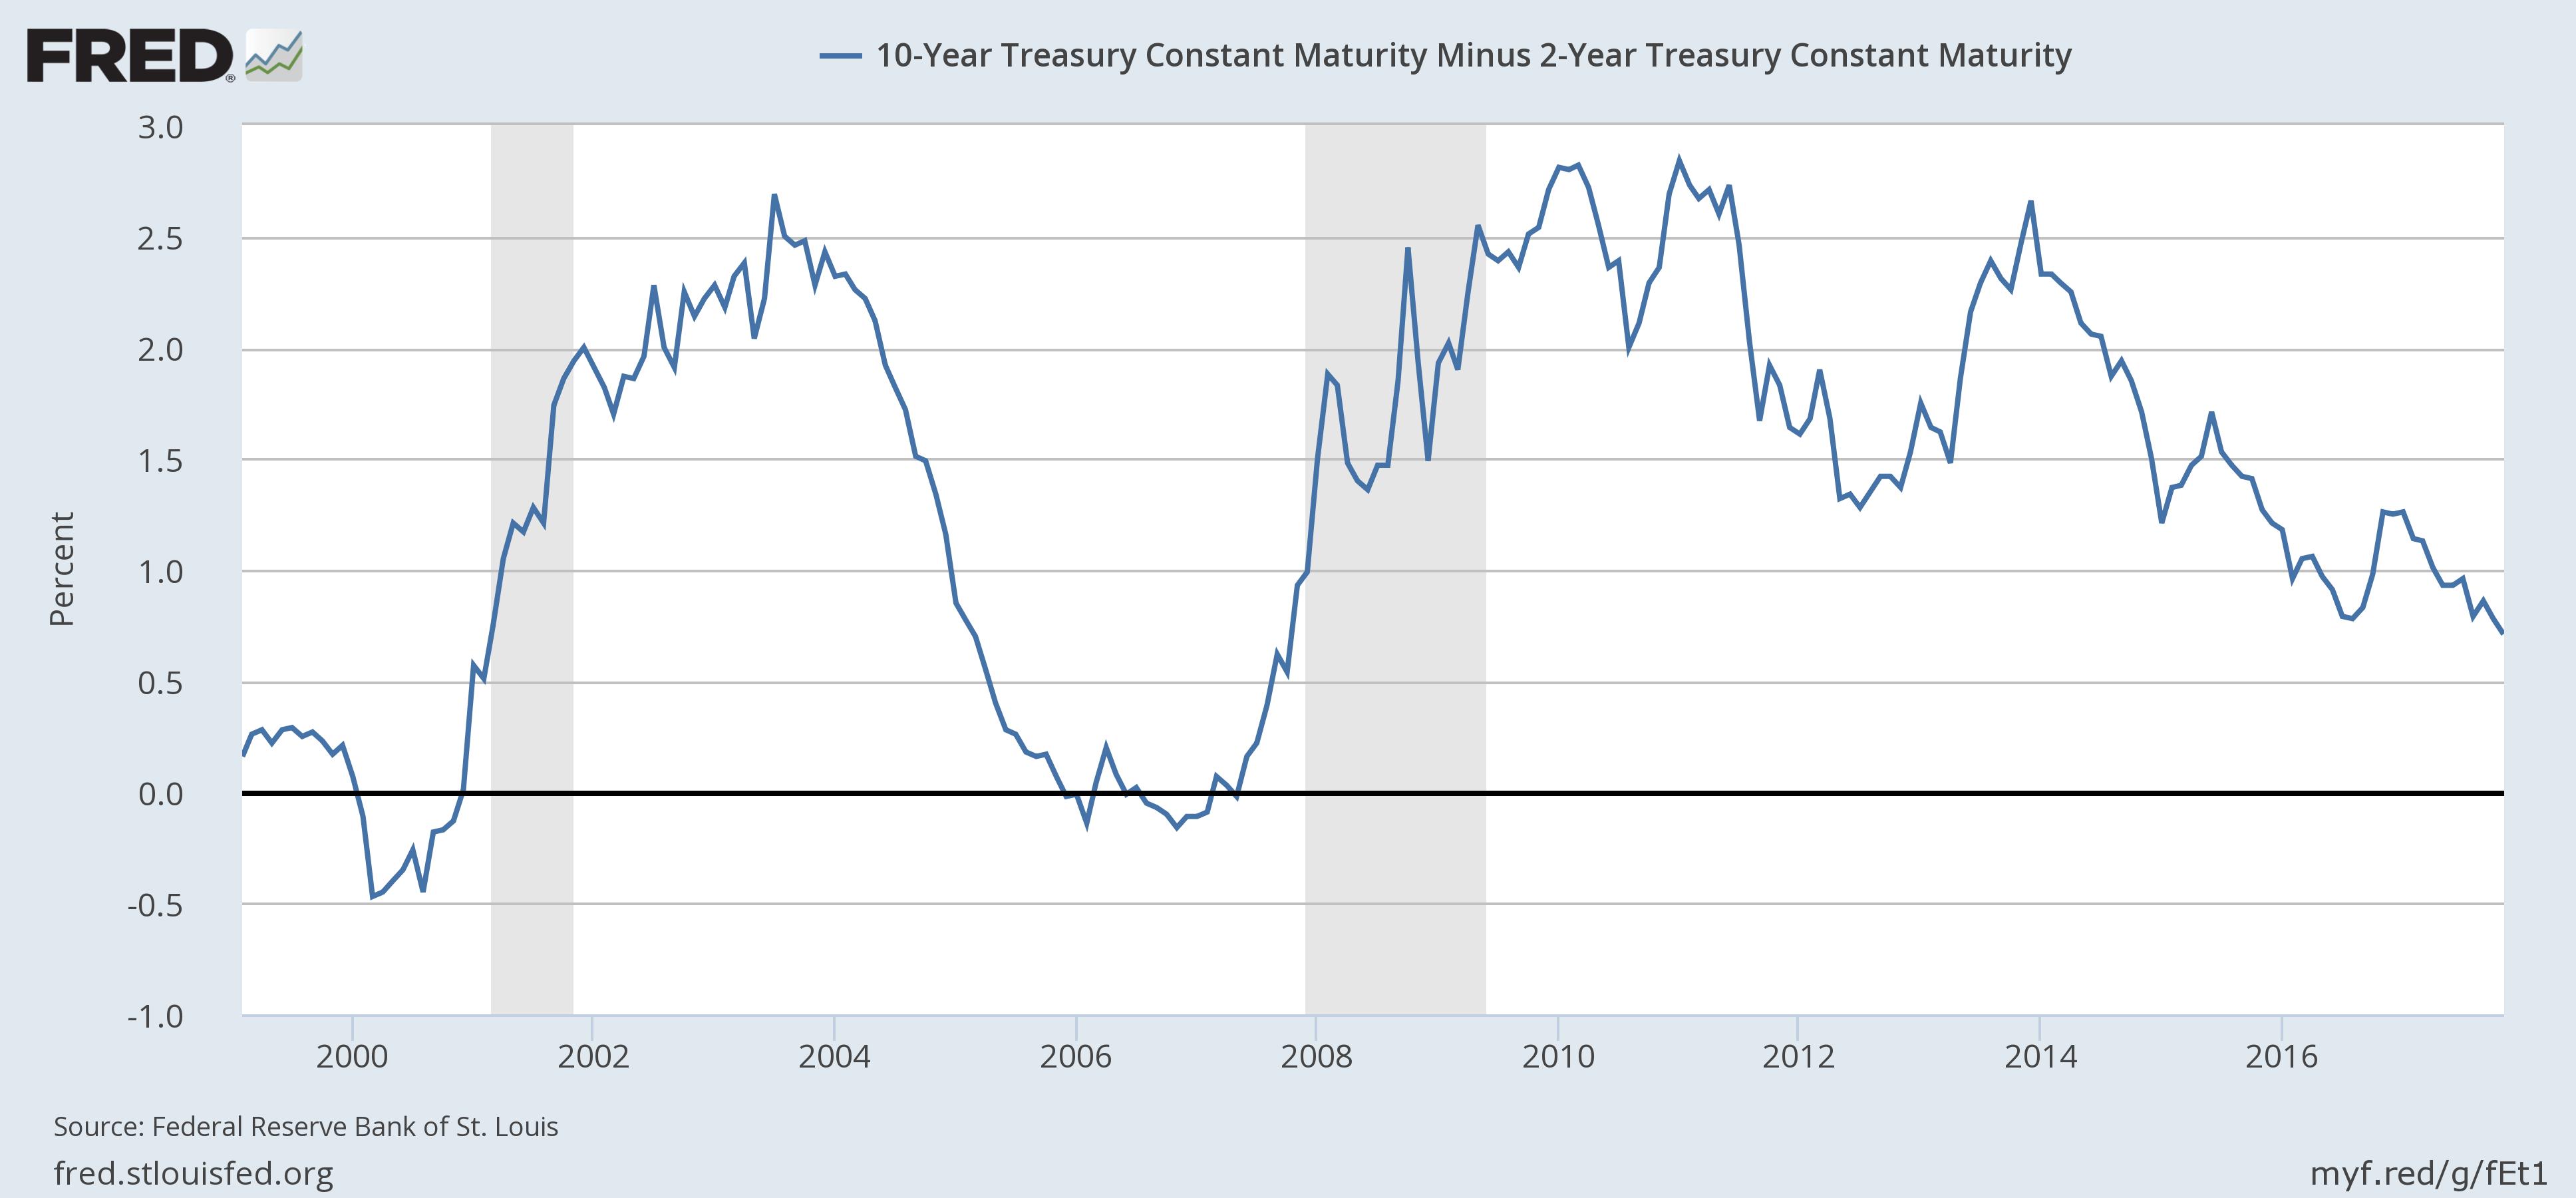 US 10 Year Treasury Constant Maturity, 2000 - 2016